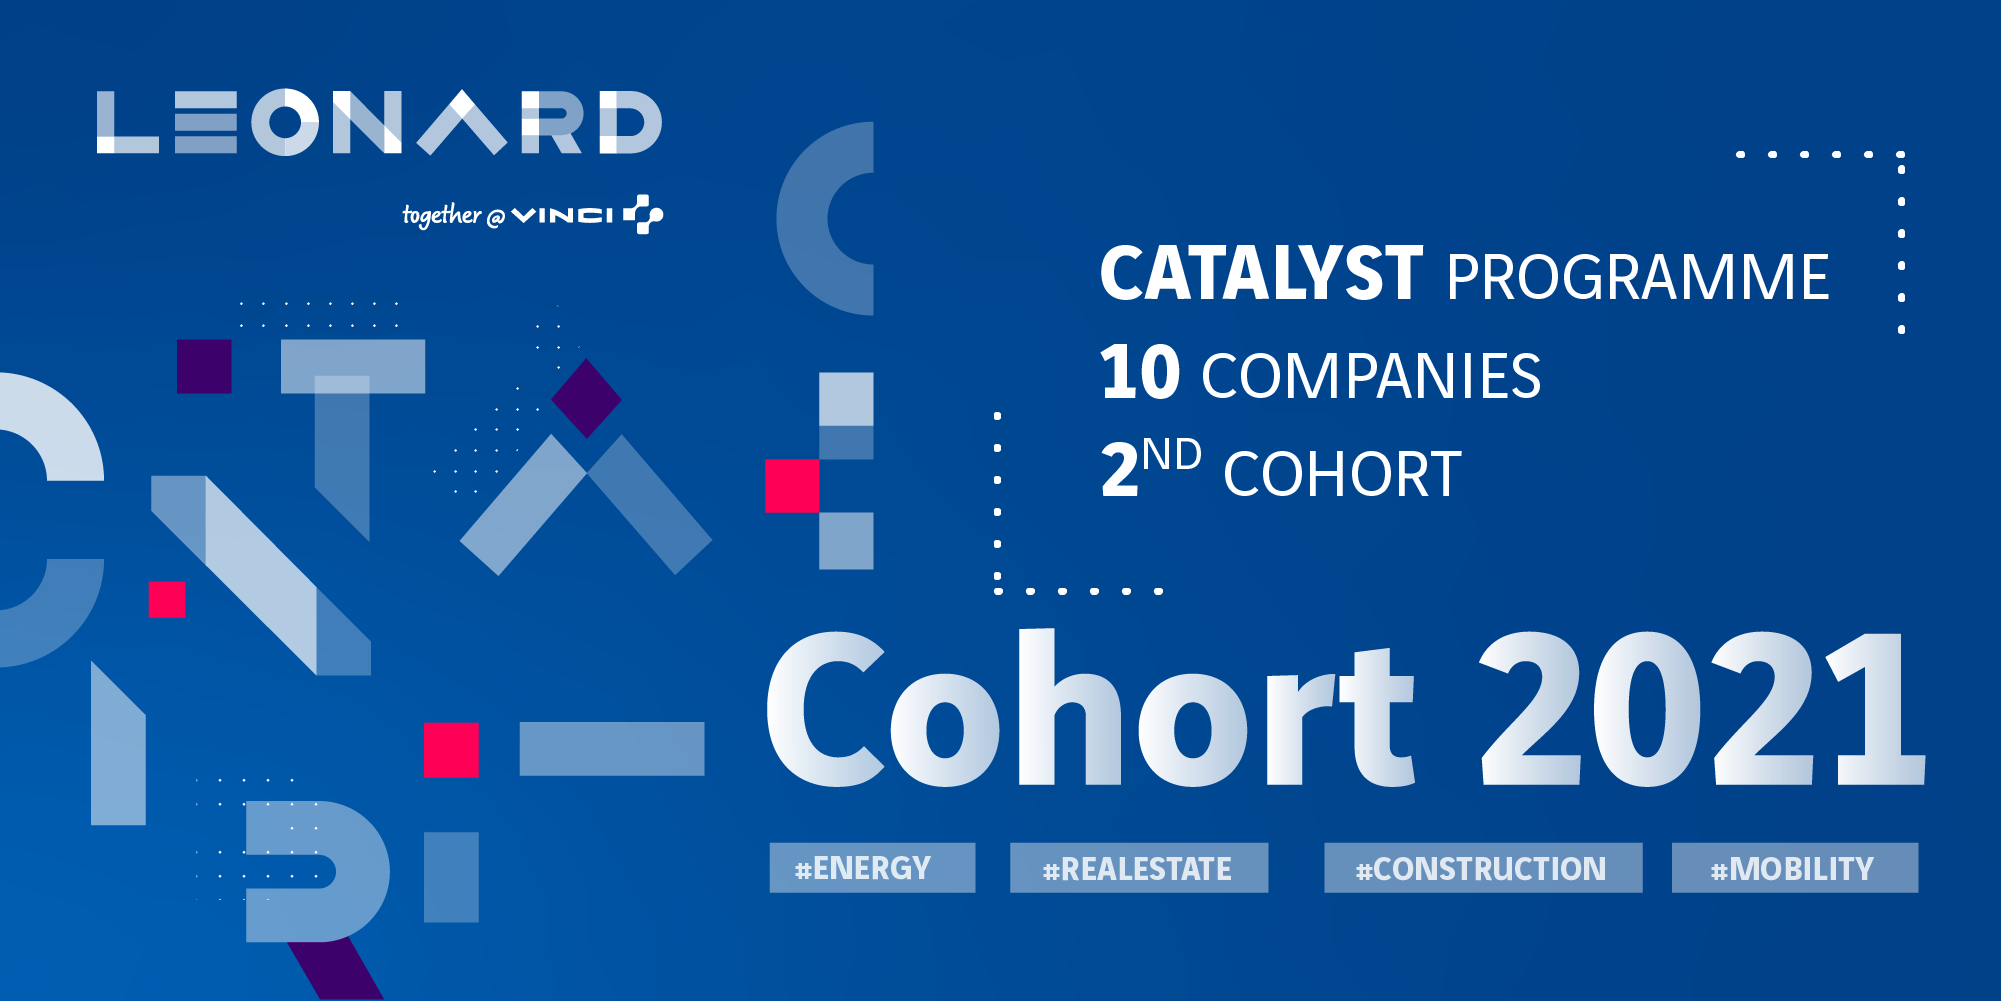 CATALYST: the 2nd cohort of Leonard's support program enrols 10 innovative companies